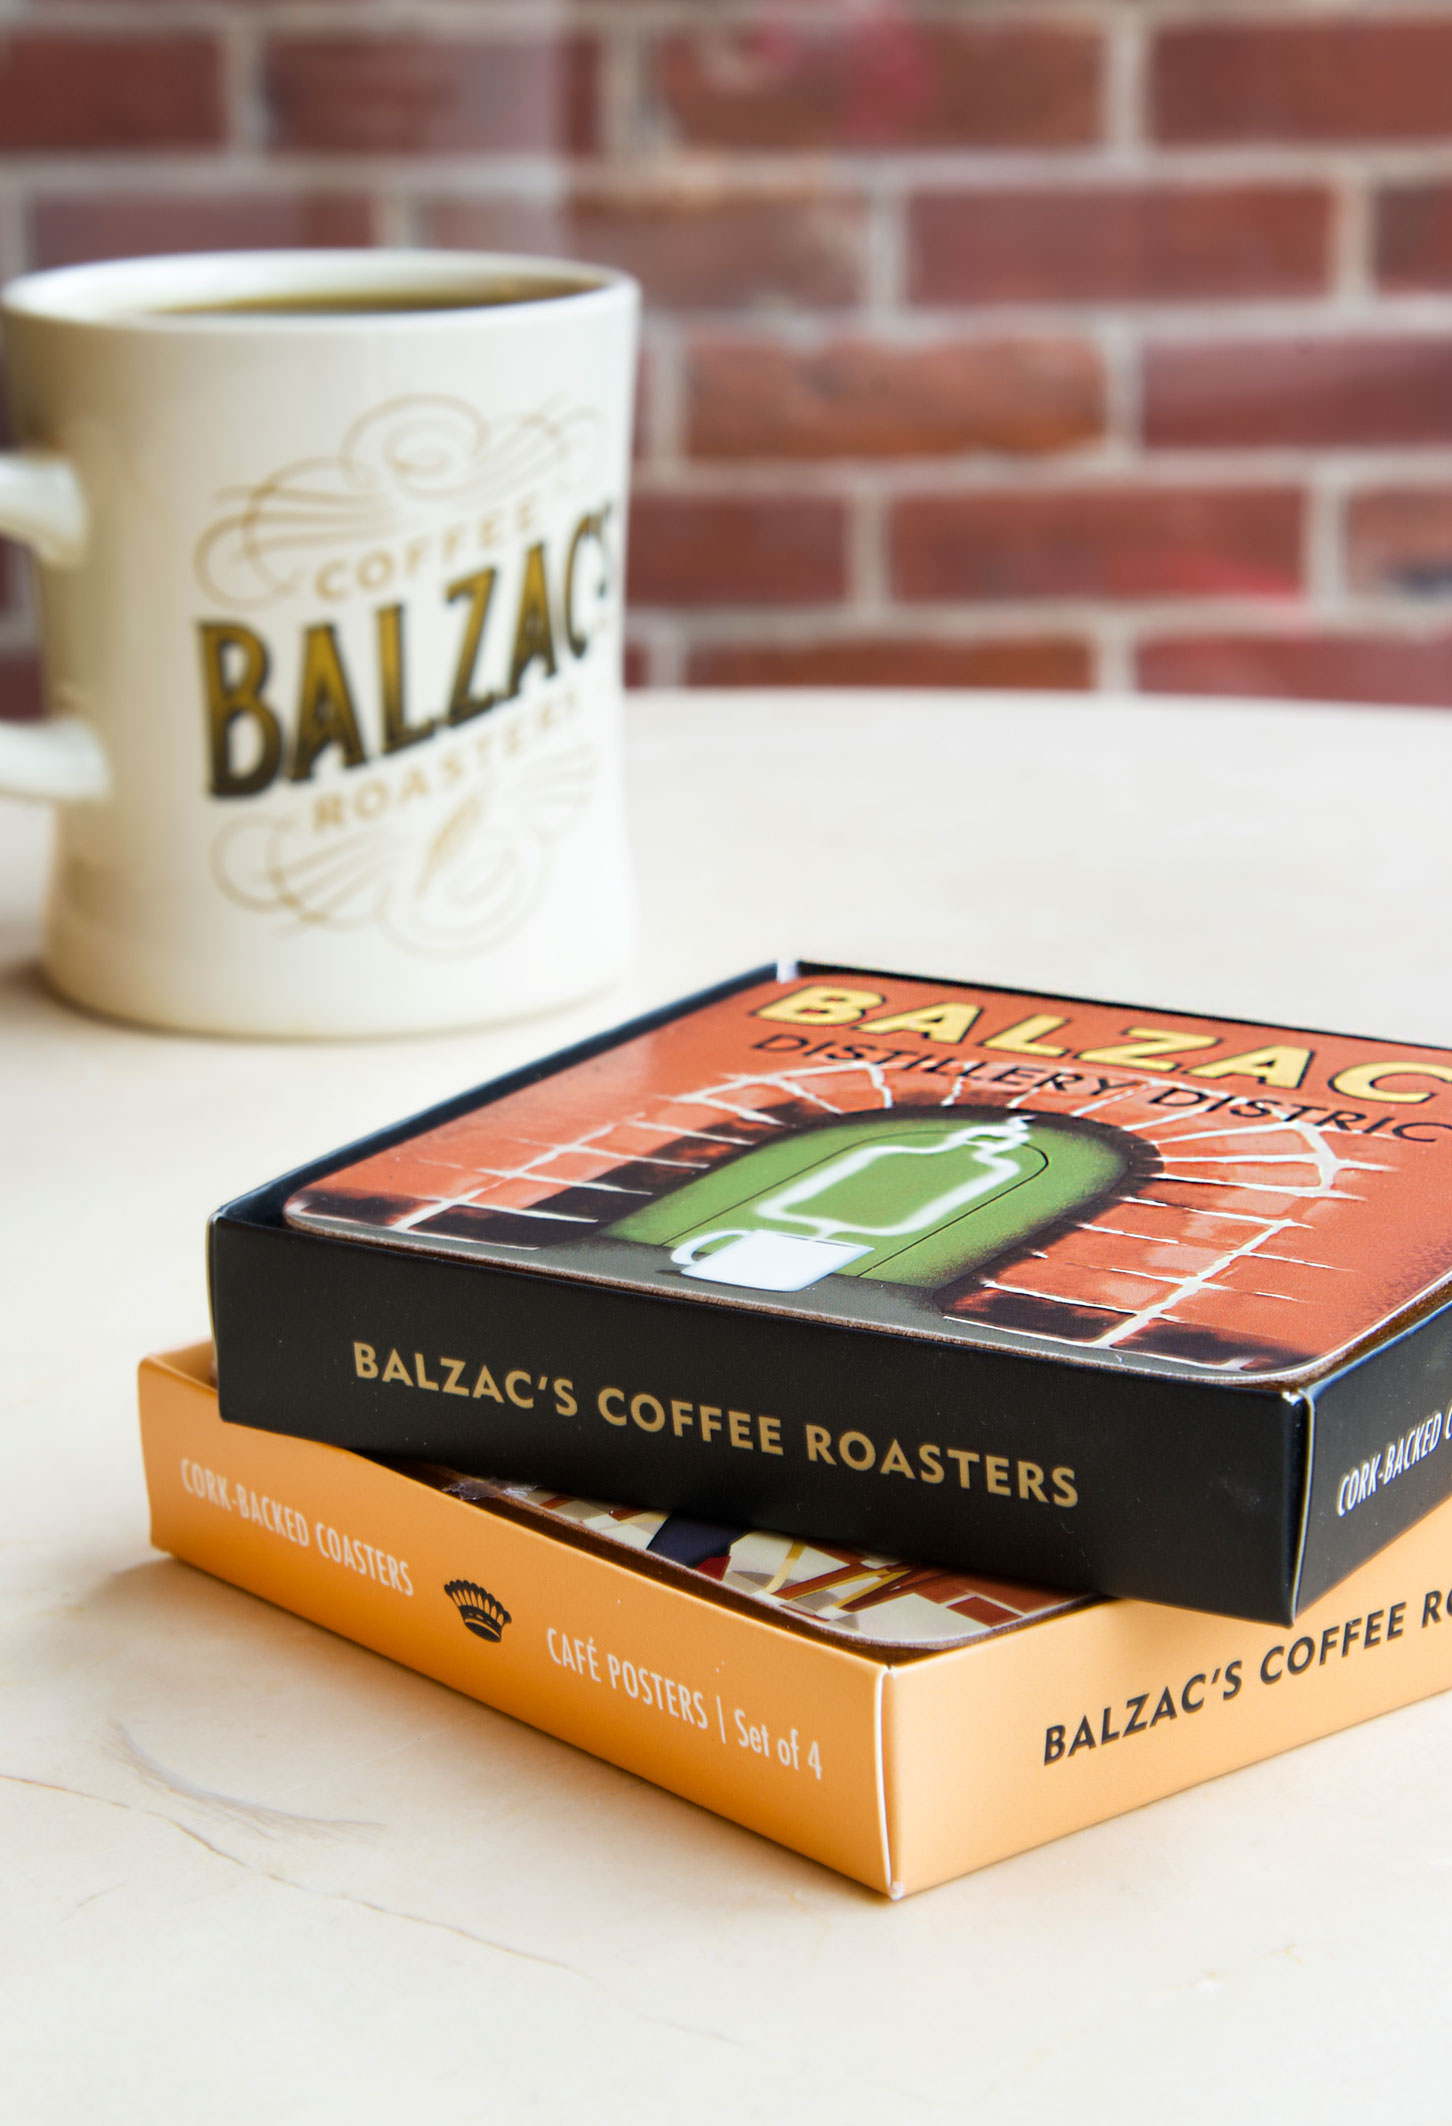 Chad Roberts Chad Roberts Design Ltd. Balzac's Coffee Roasters Brand Identity Design Merchandise Design